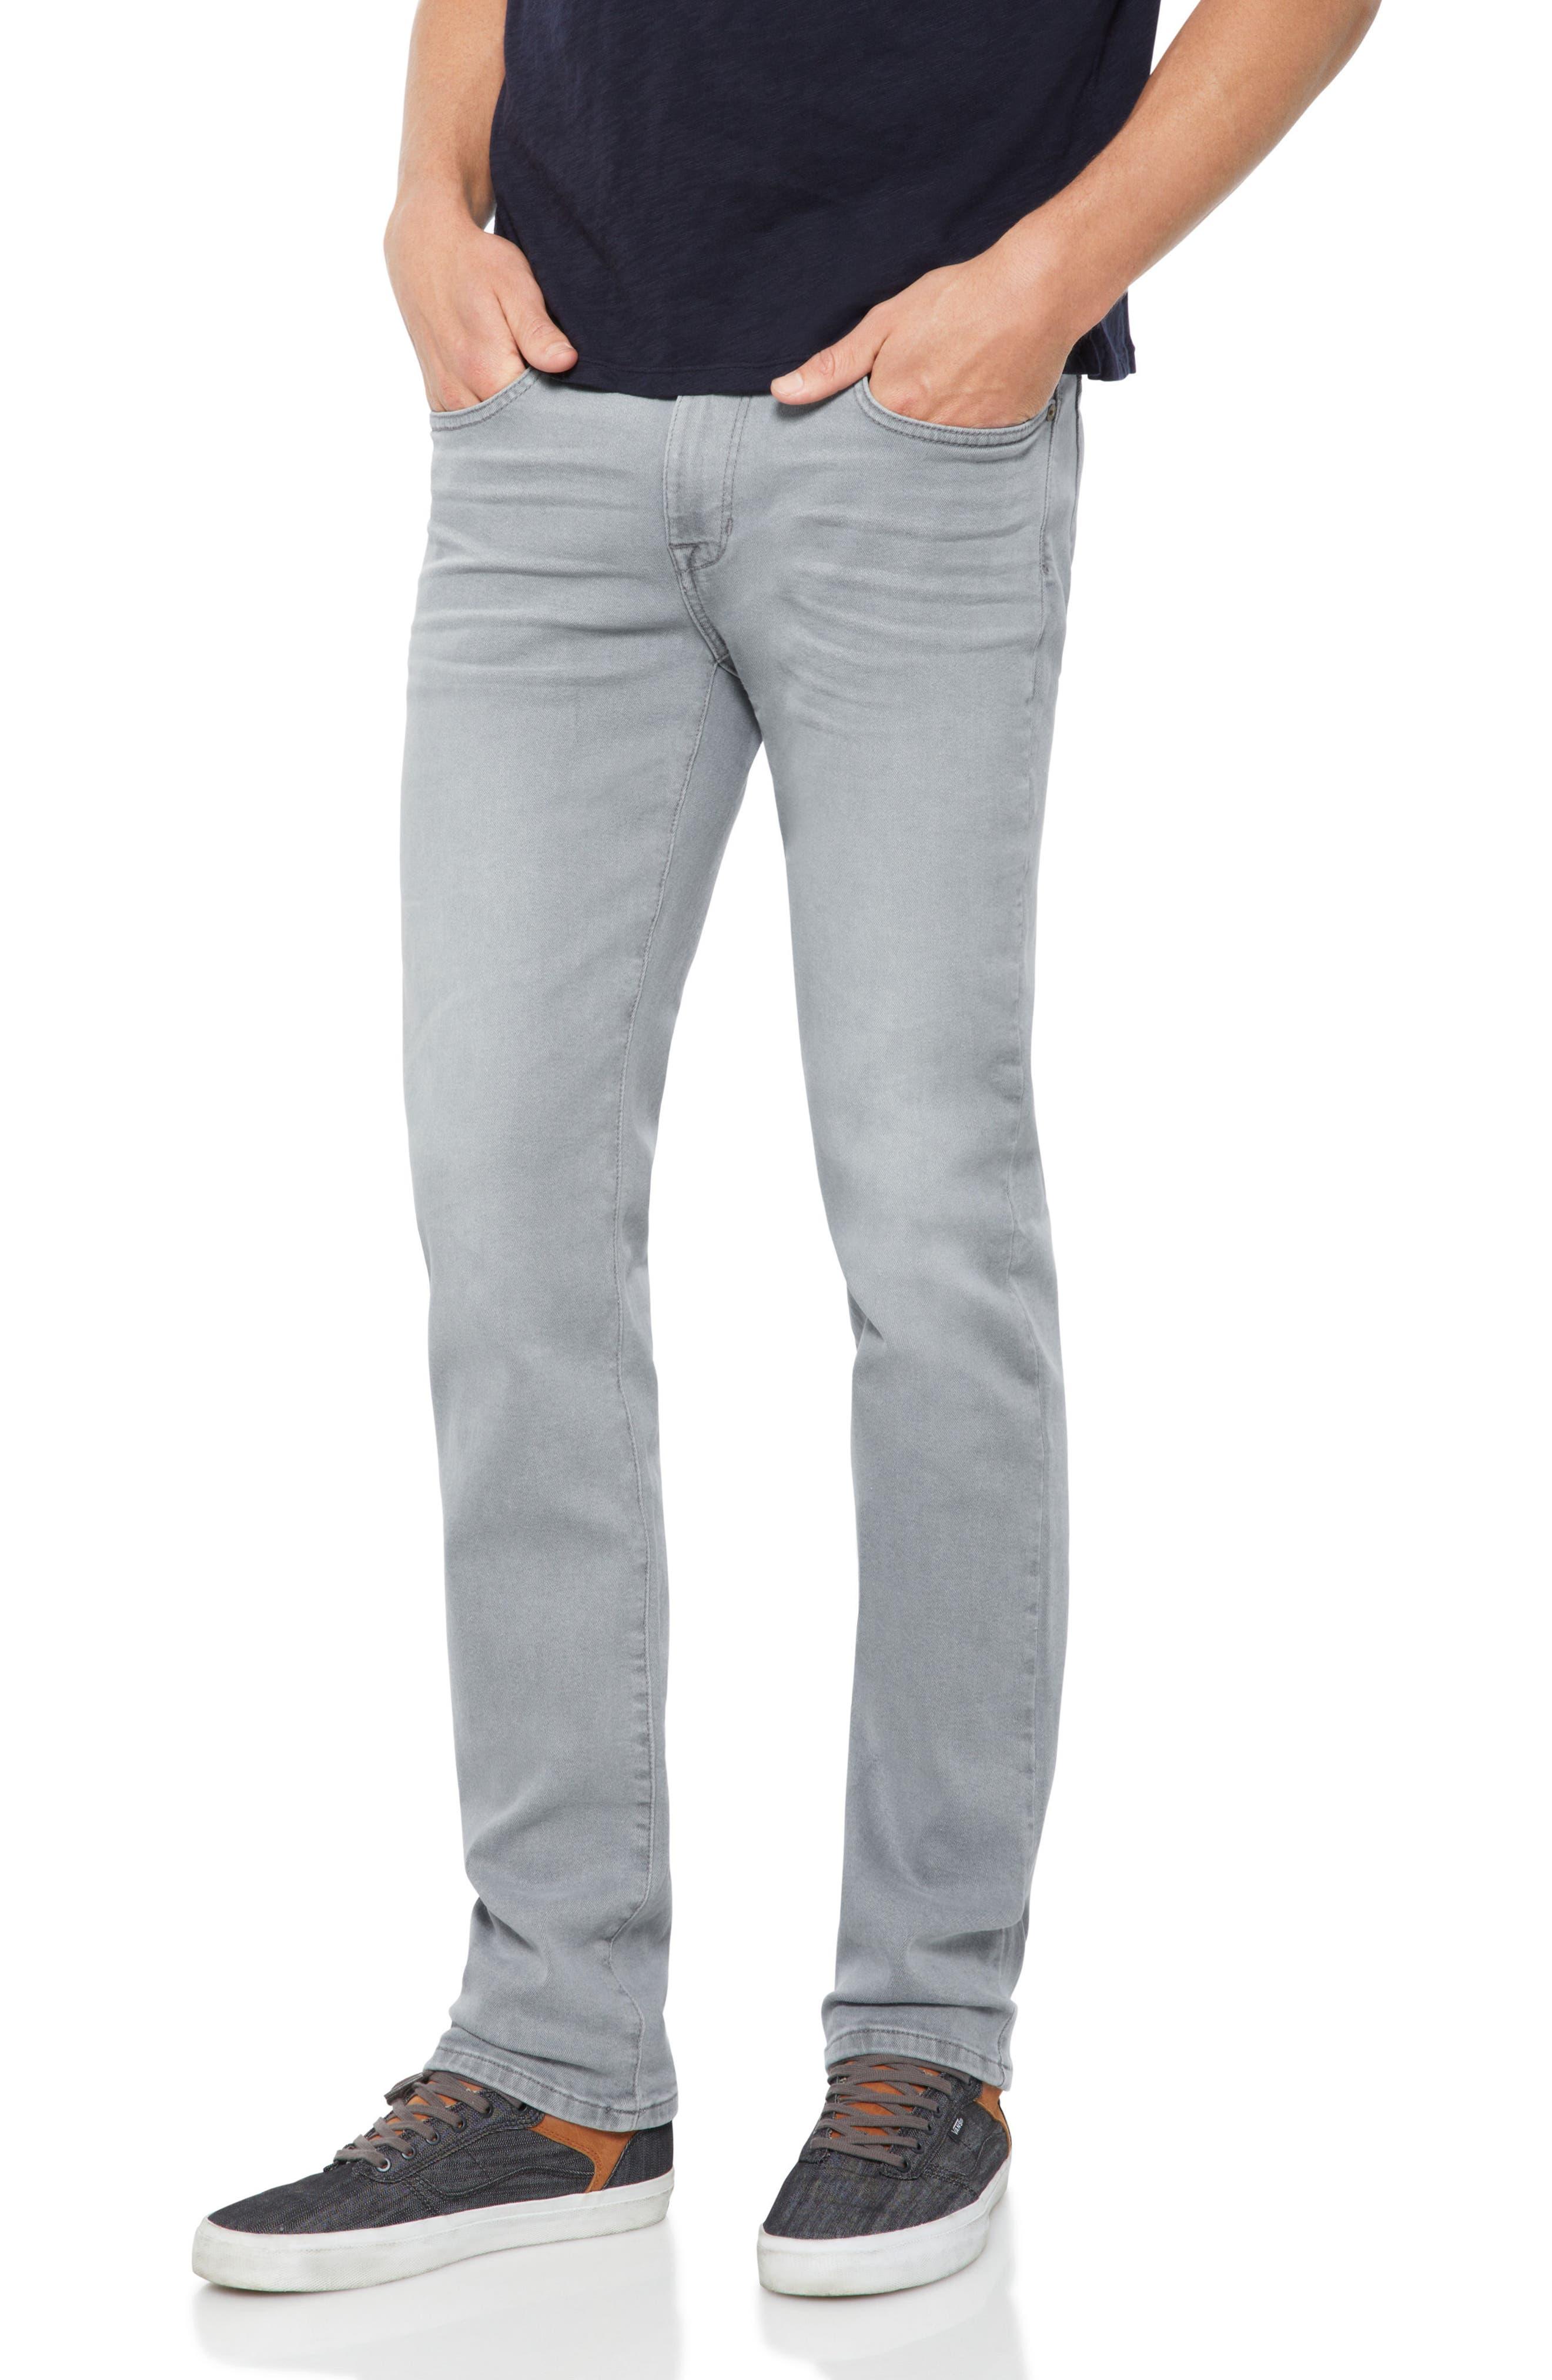 Brixton Slim Straight Leg Jeans,                         Main,                         color, Feather